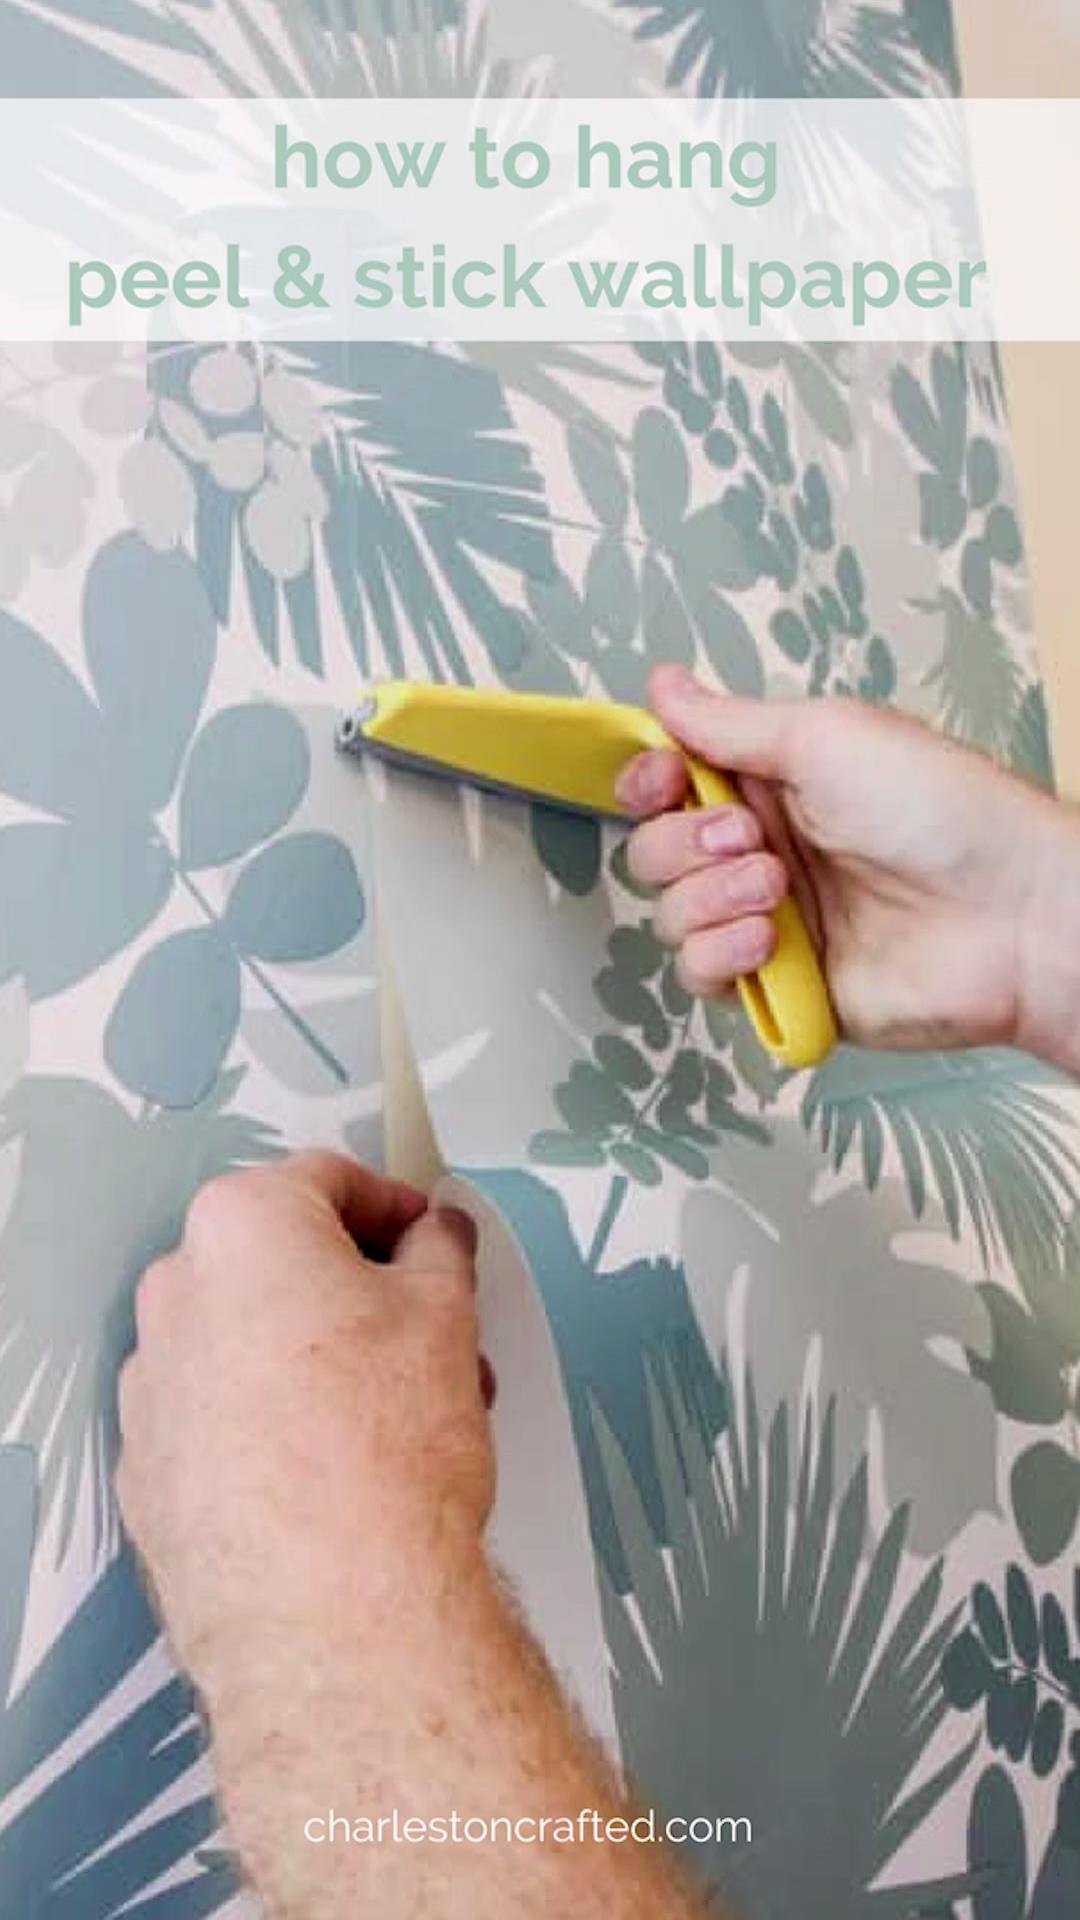 How To Hang Peel Stick Wallpaper Video Video Peel And Stick Wallpaper Stick On Wallpaper Peel N Stick Wallpaper